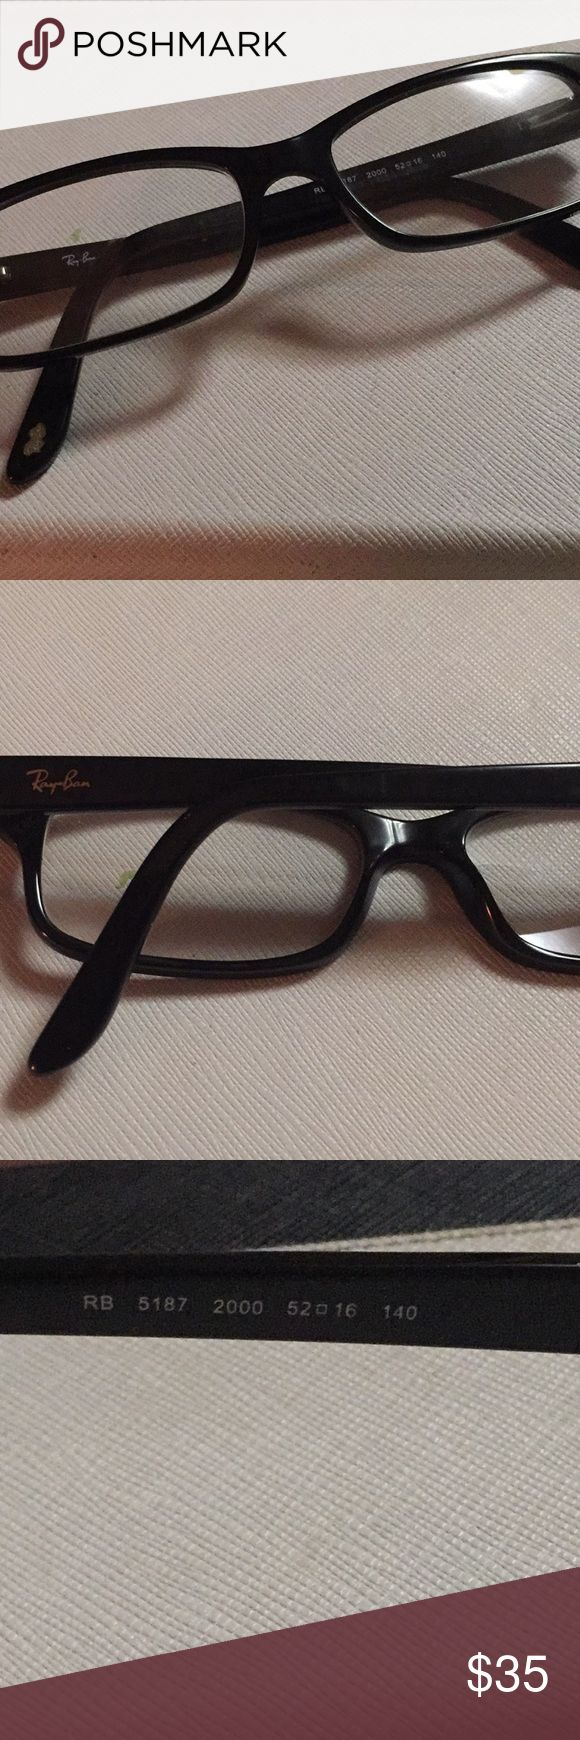 Ray-Ban eyeglasses Ray Ban 5187 eyeglasses rectangular  Size 16-52-140 Add your own prescription Ray-Ban Accessories Glasses